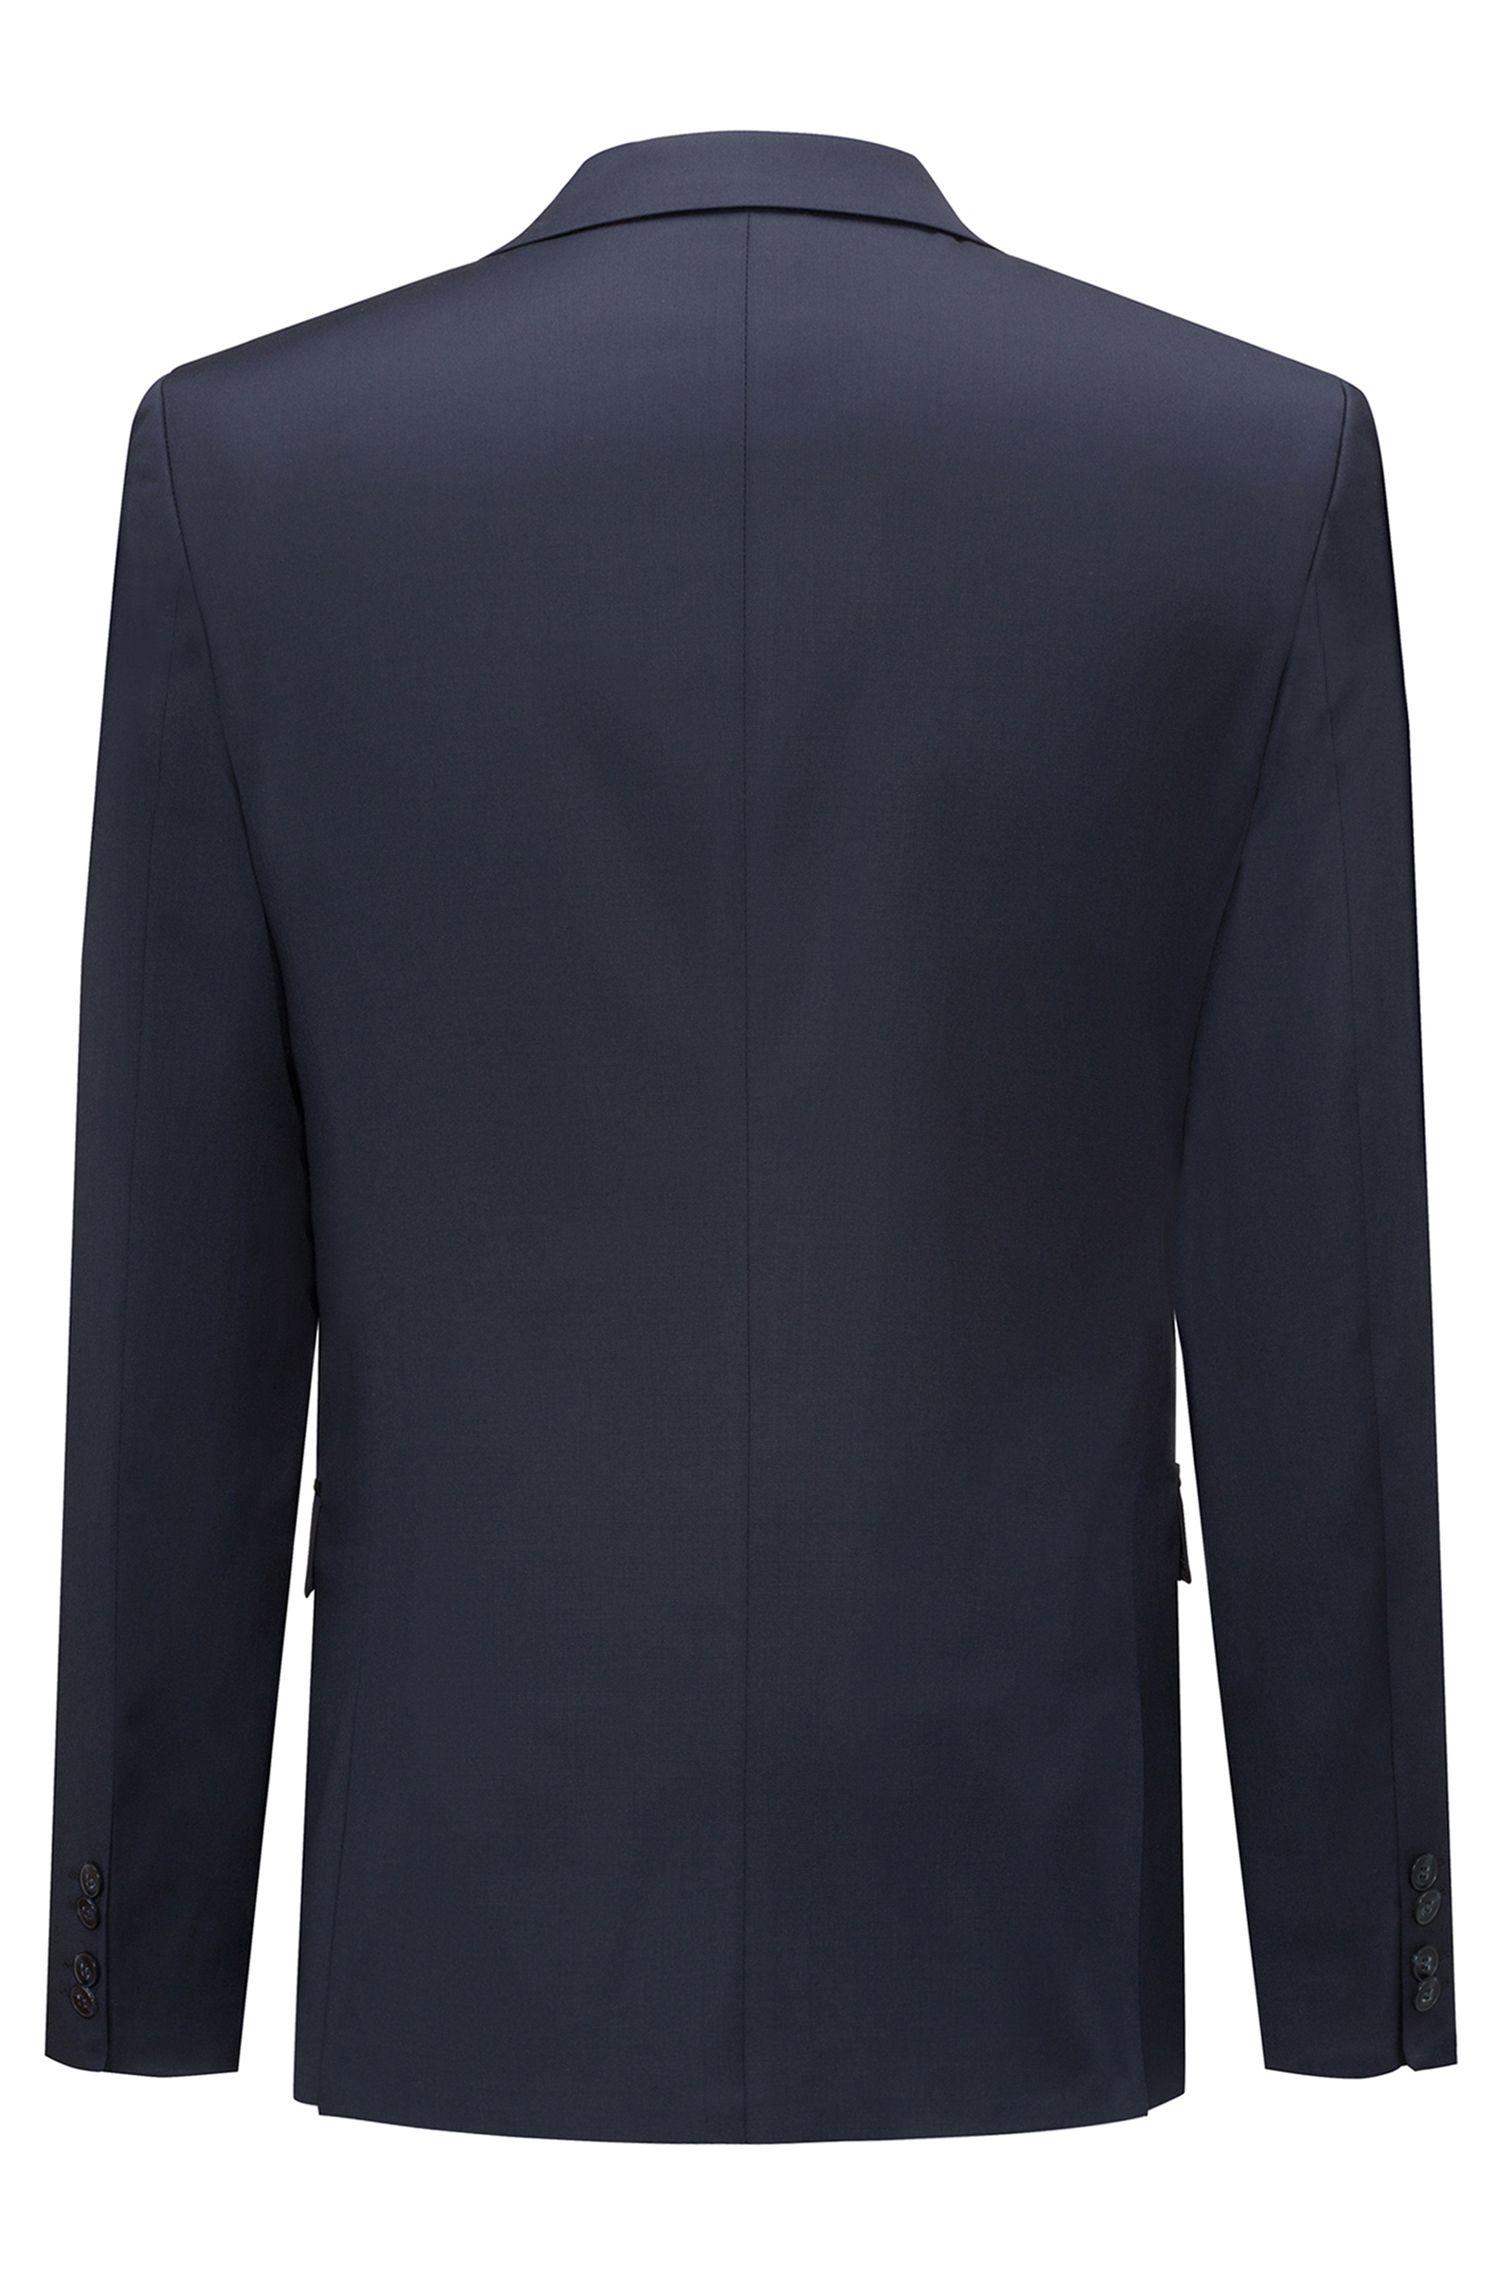 Giacca extra slim fit in lana vergine tinta in filo, Blu scuro